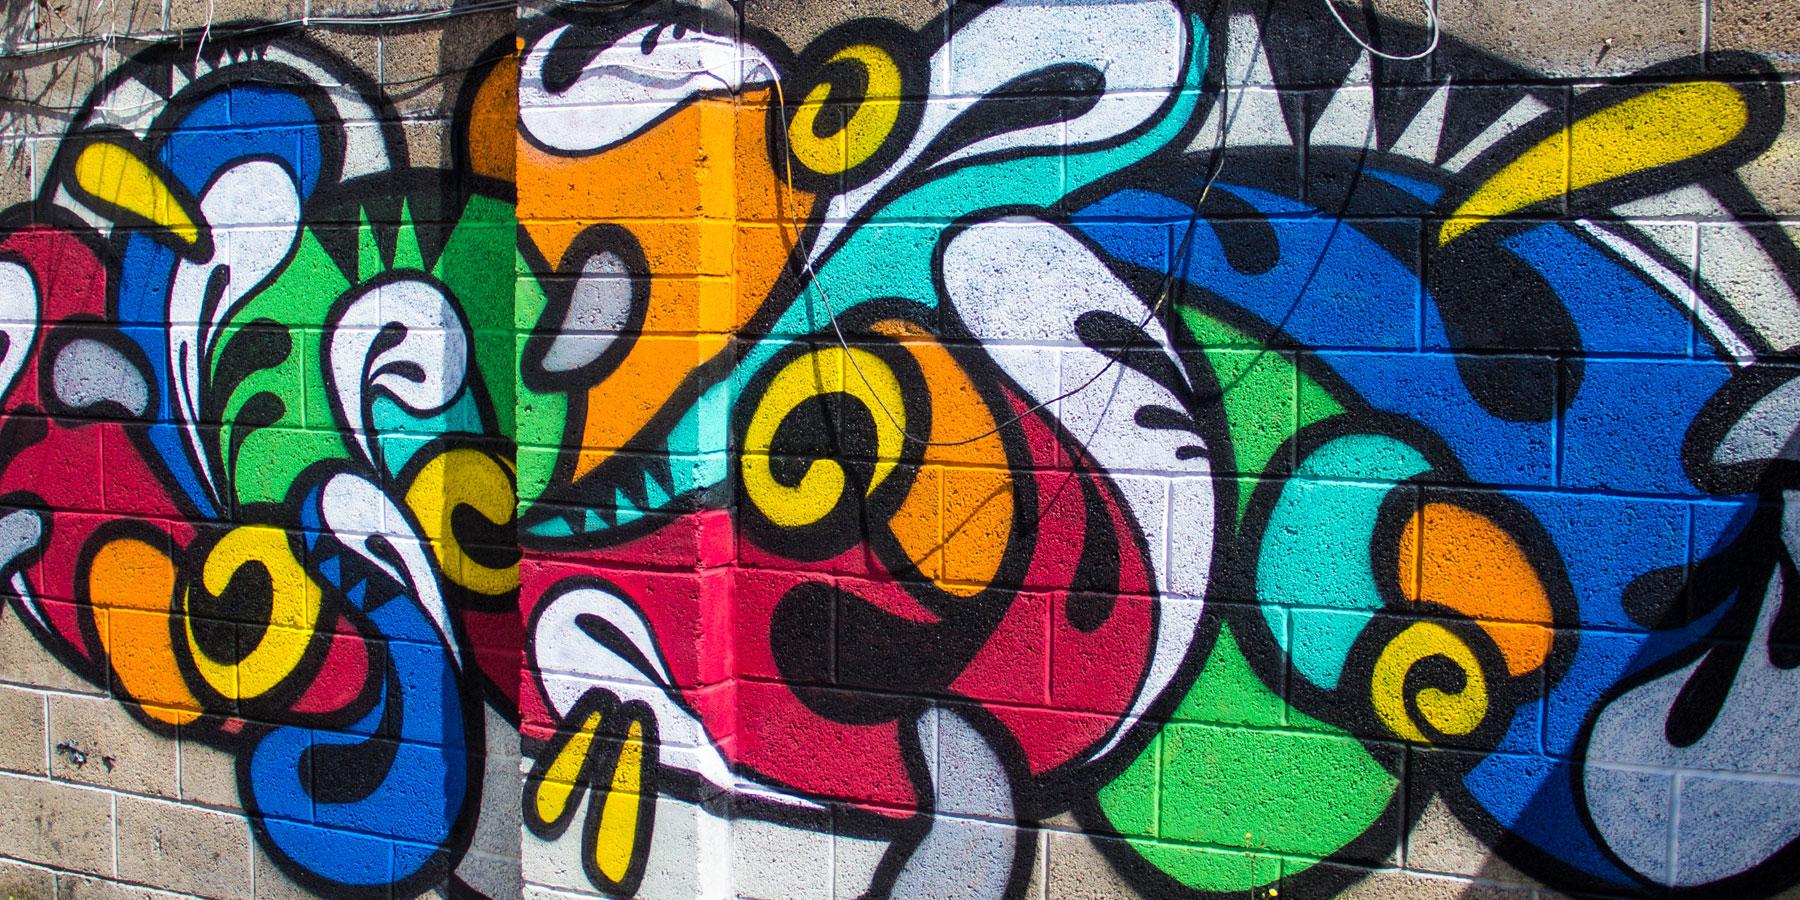 stannaery-brewing-company-street-art-mural